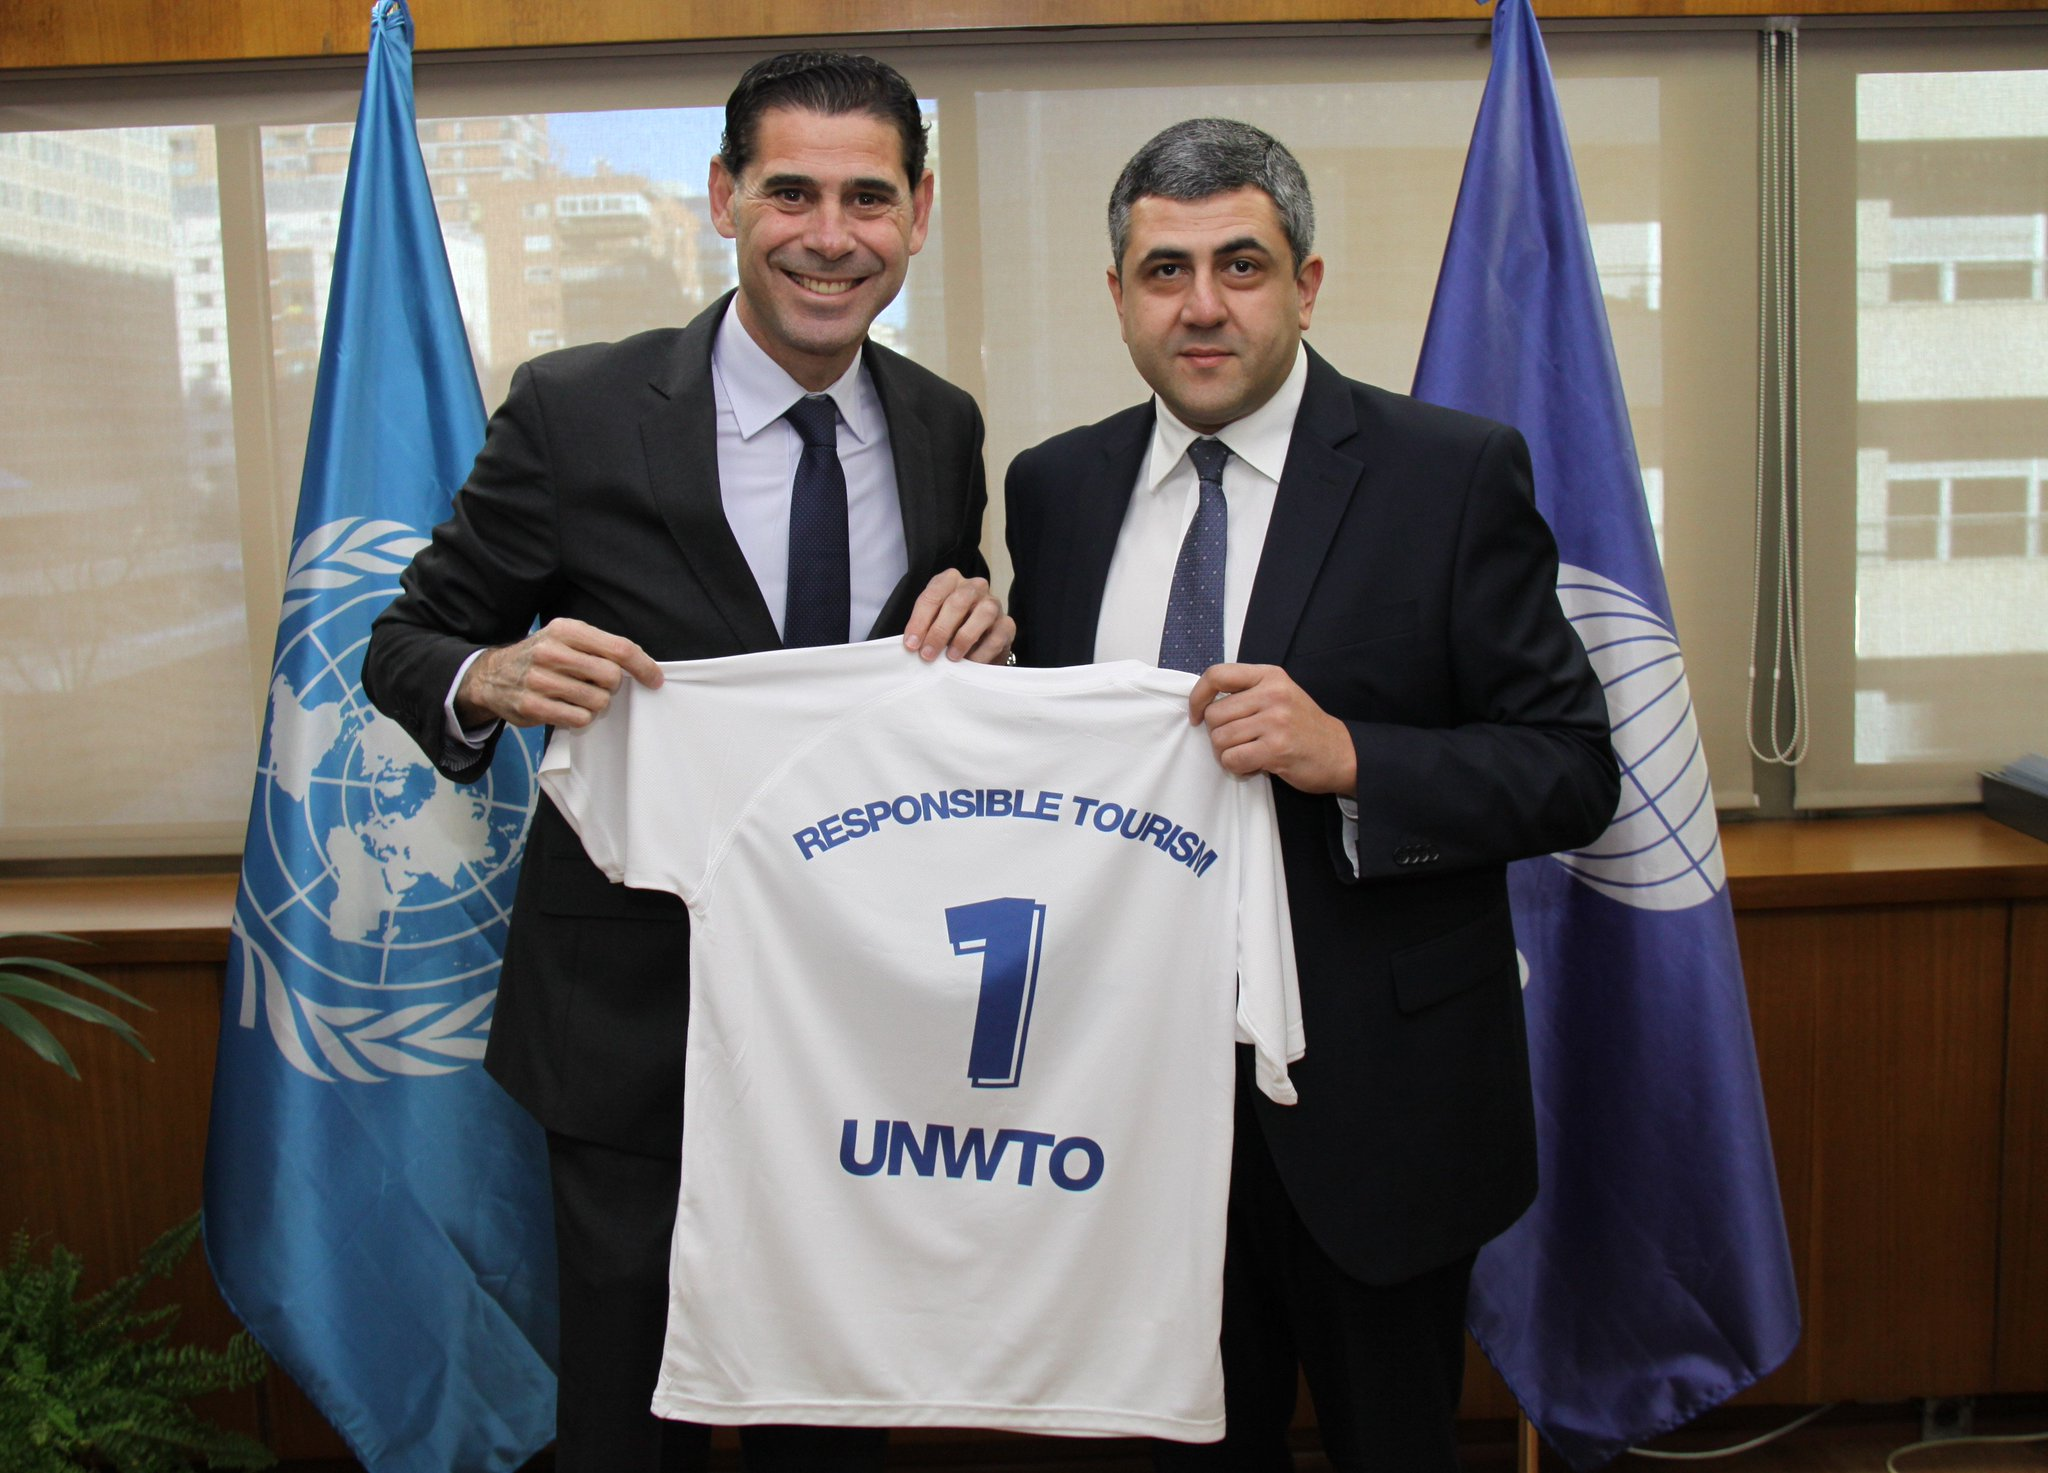 Fernando Hierro, nuevo Embajador de Turismo Responsable de la @UNWTO  https://t.co/alhkpuy5MA https://t.co/YIzMavv6zo